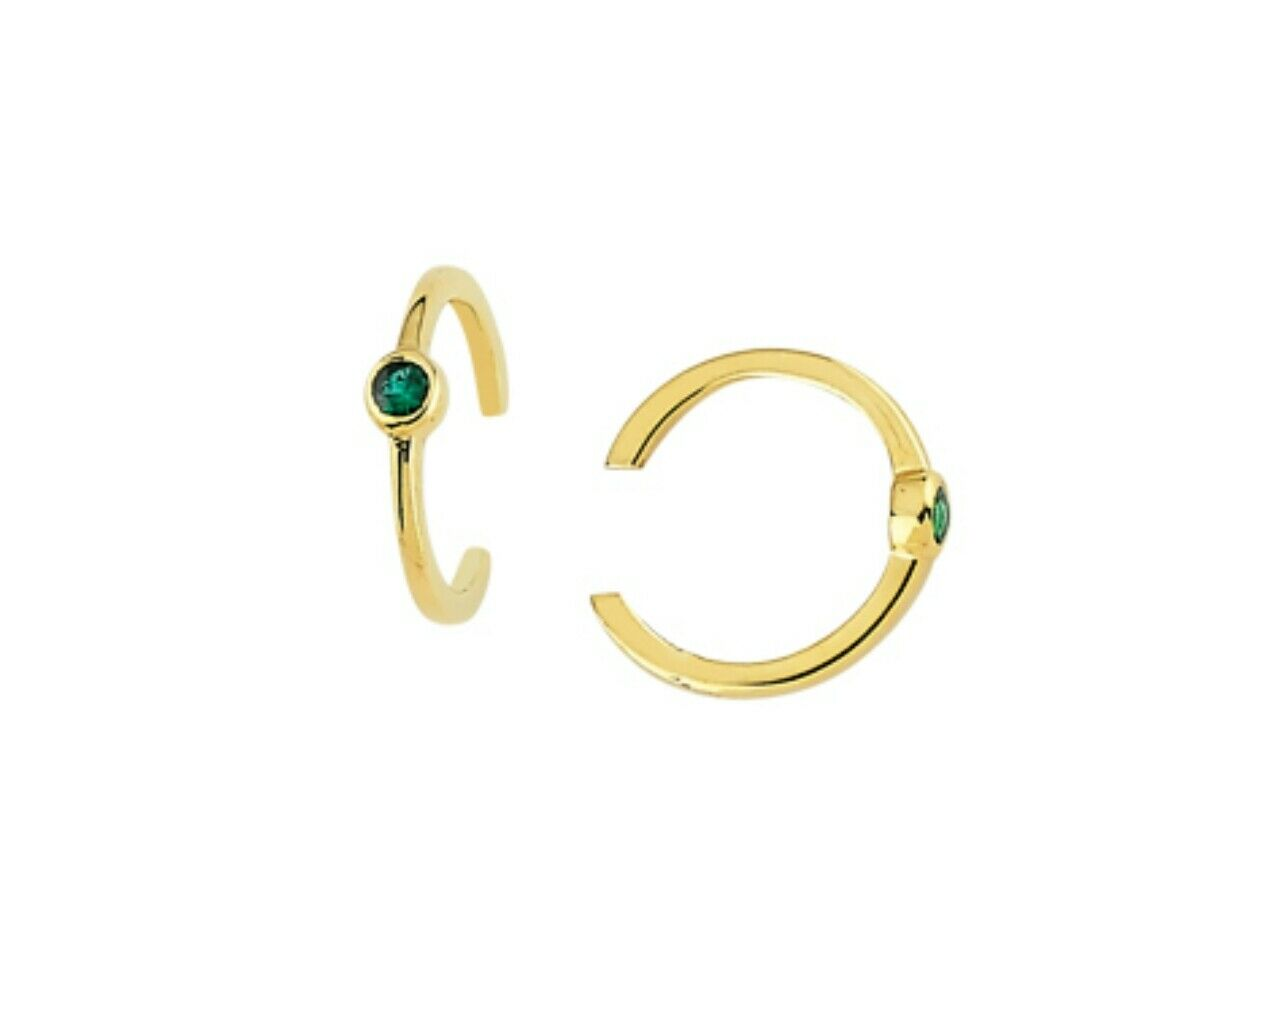 Emerald and 14k ear cuff